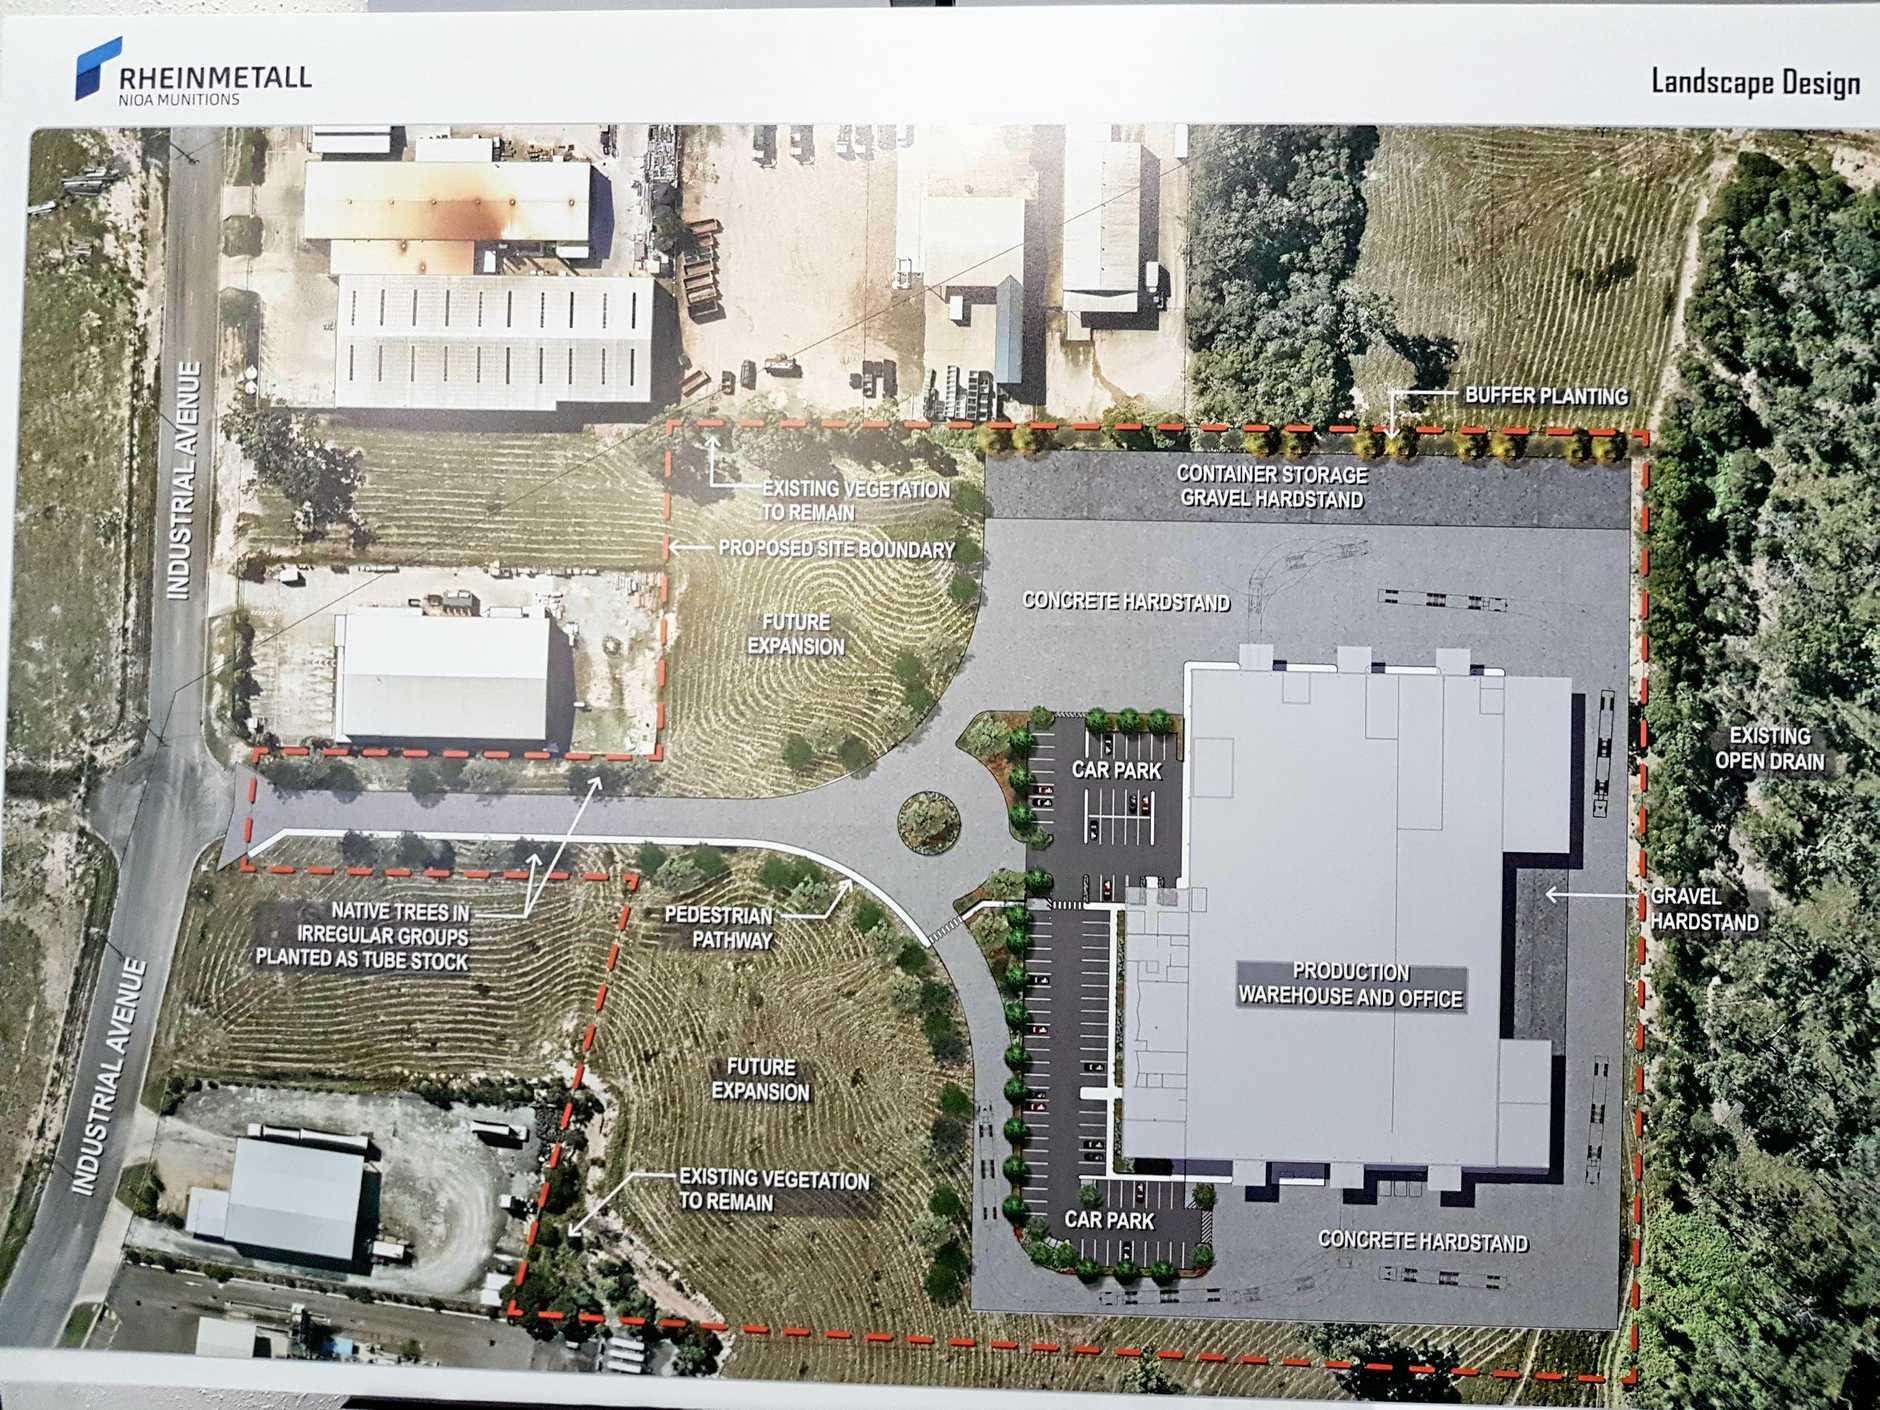 Concept designs of the Rheinmetall NIOA Munitions factory at Maryborough's Moonaboola Industrial Estate.